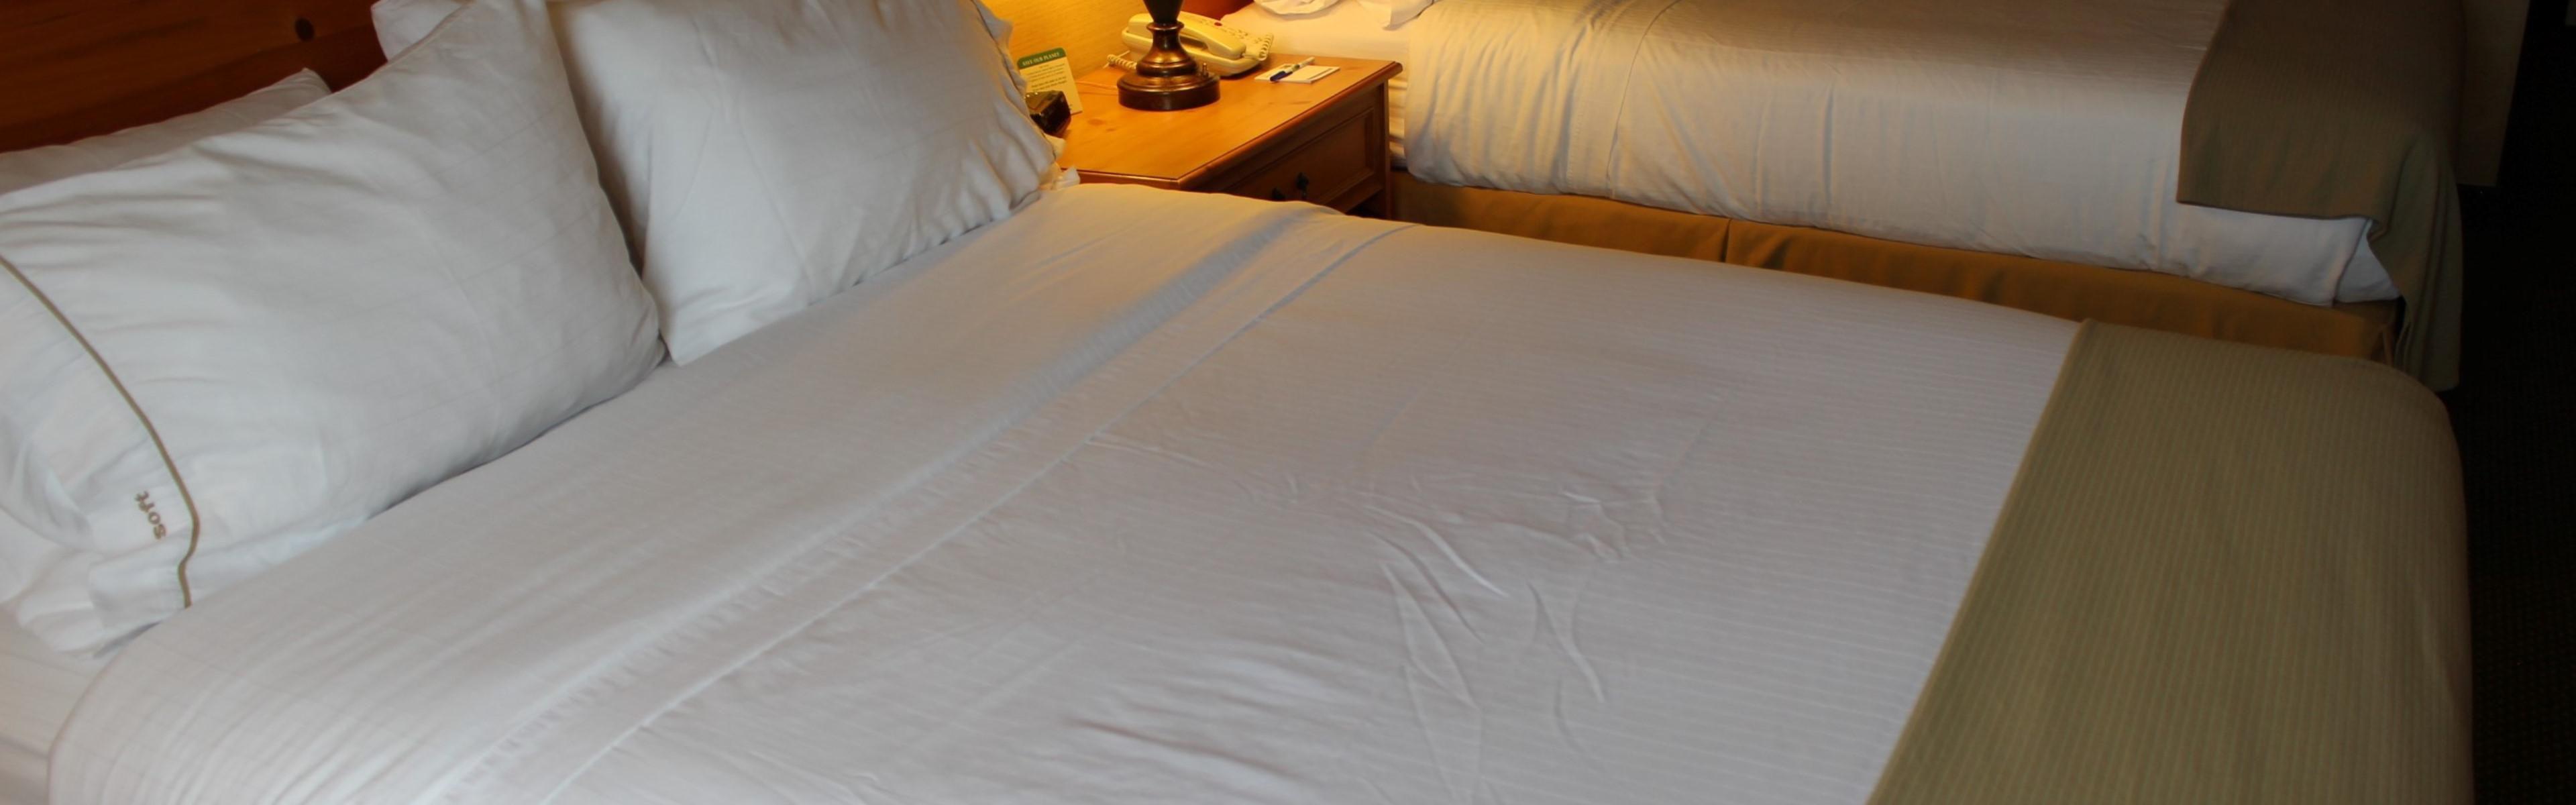 Holiday Inn Express & Suites Warrenton image 1